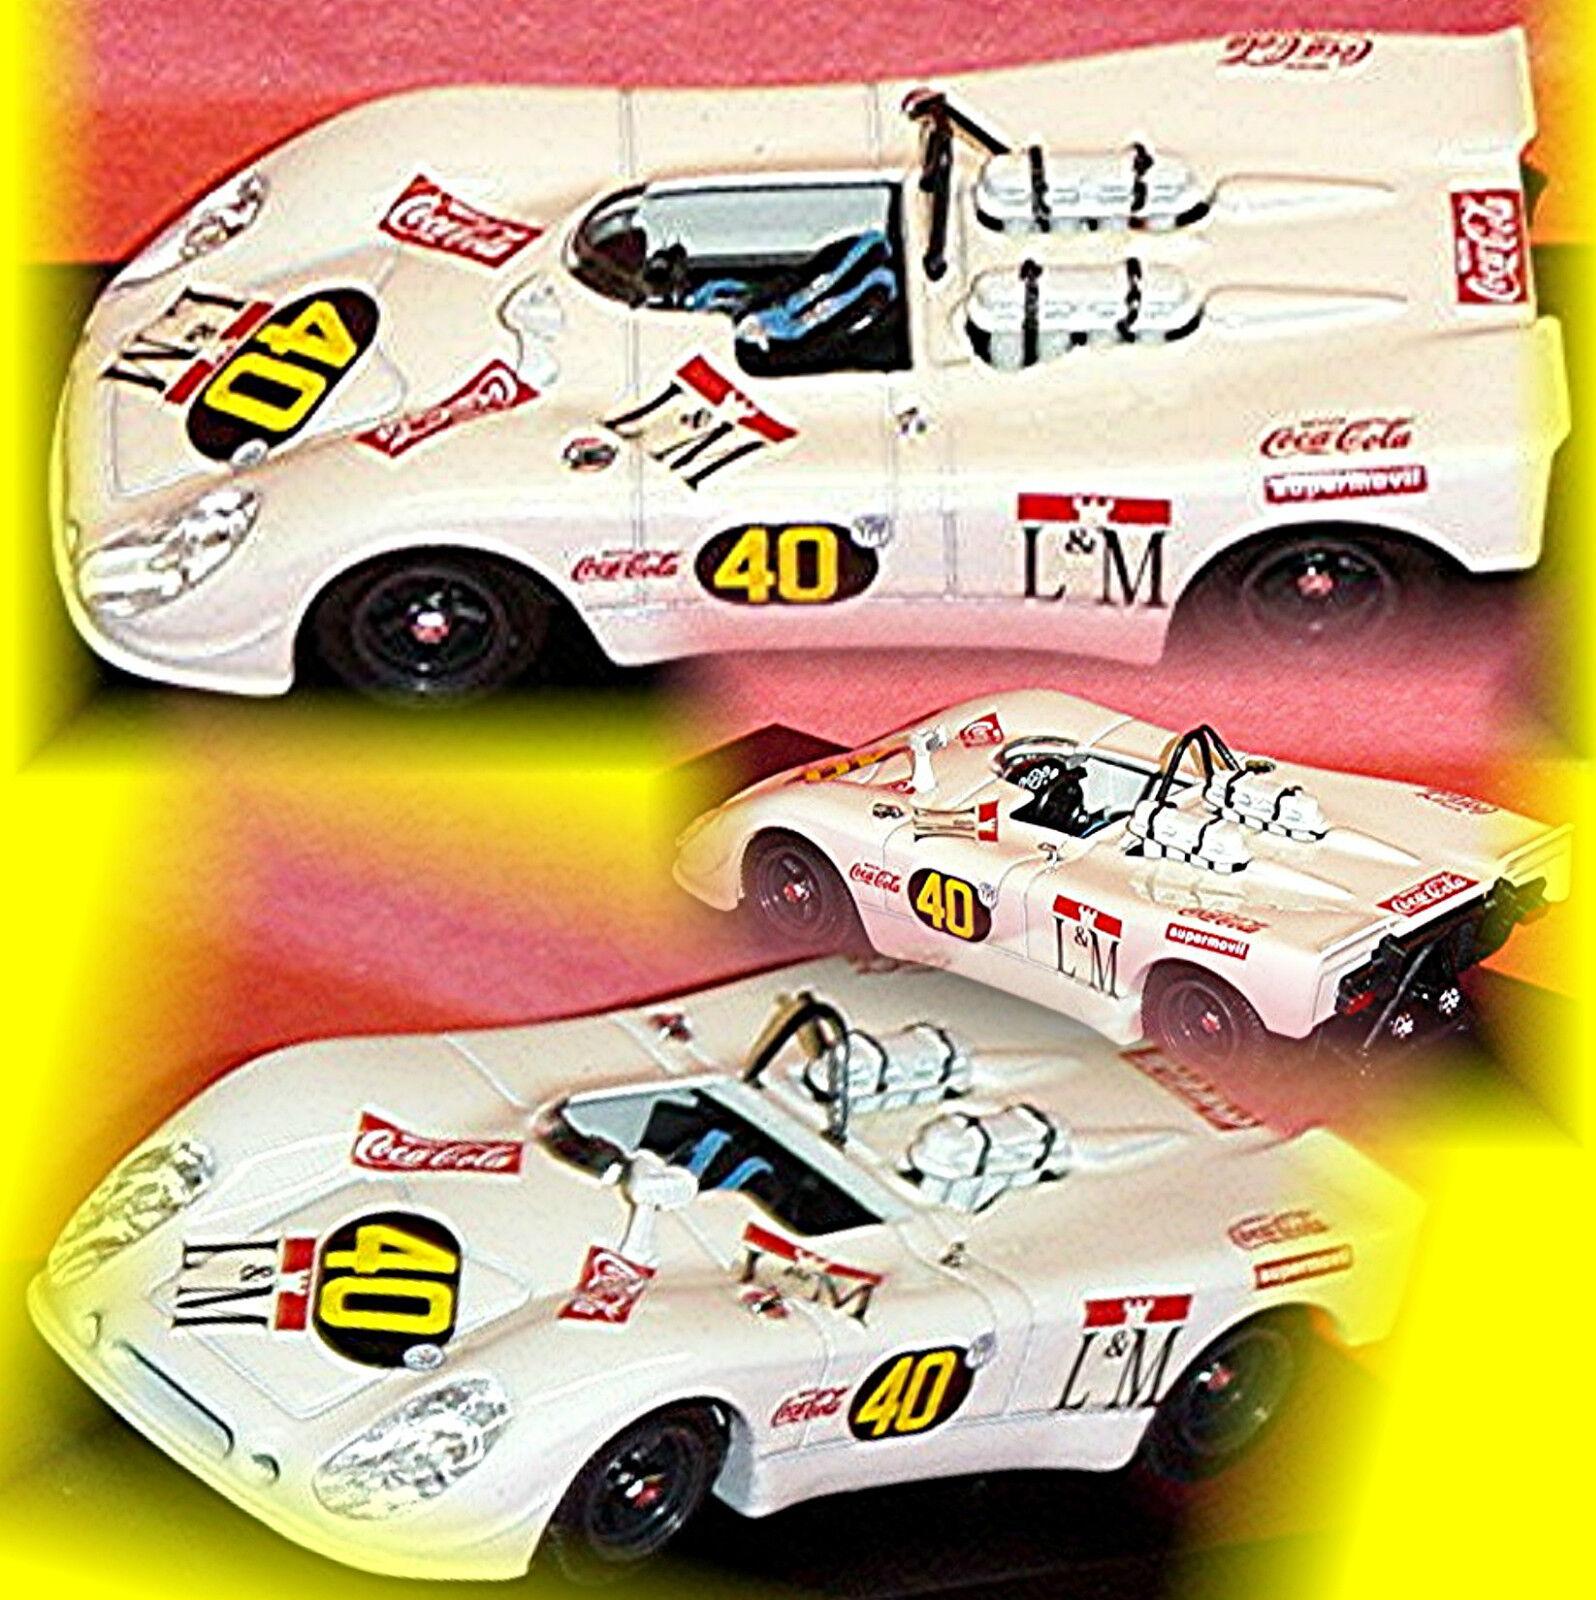 Porsche 908 2 suprême Temporada 1970  40 deoadenet Pairetti 1 43 Best Model